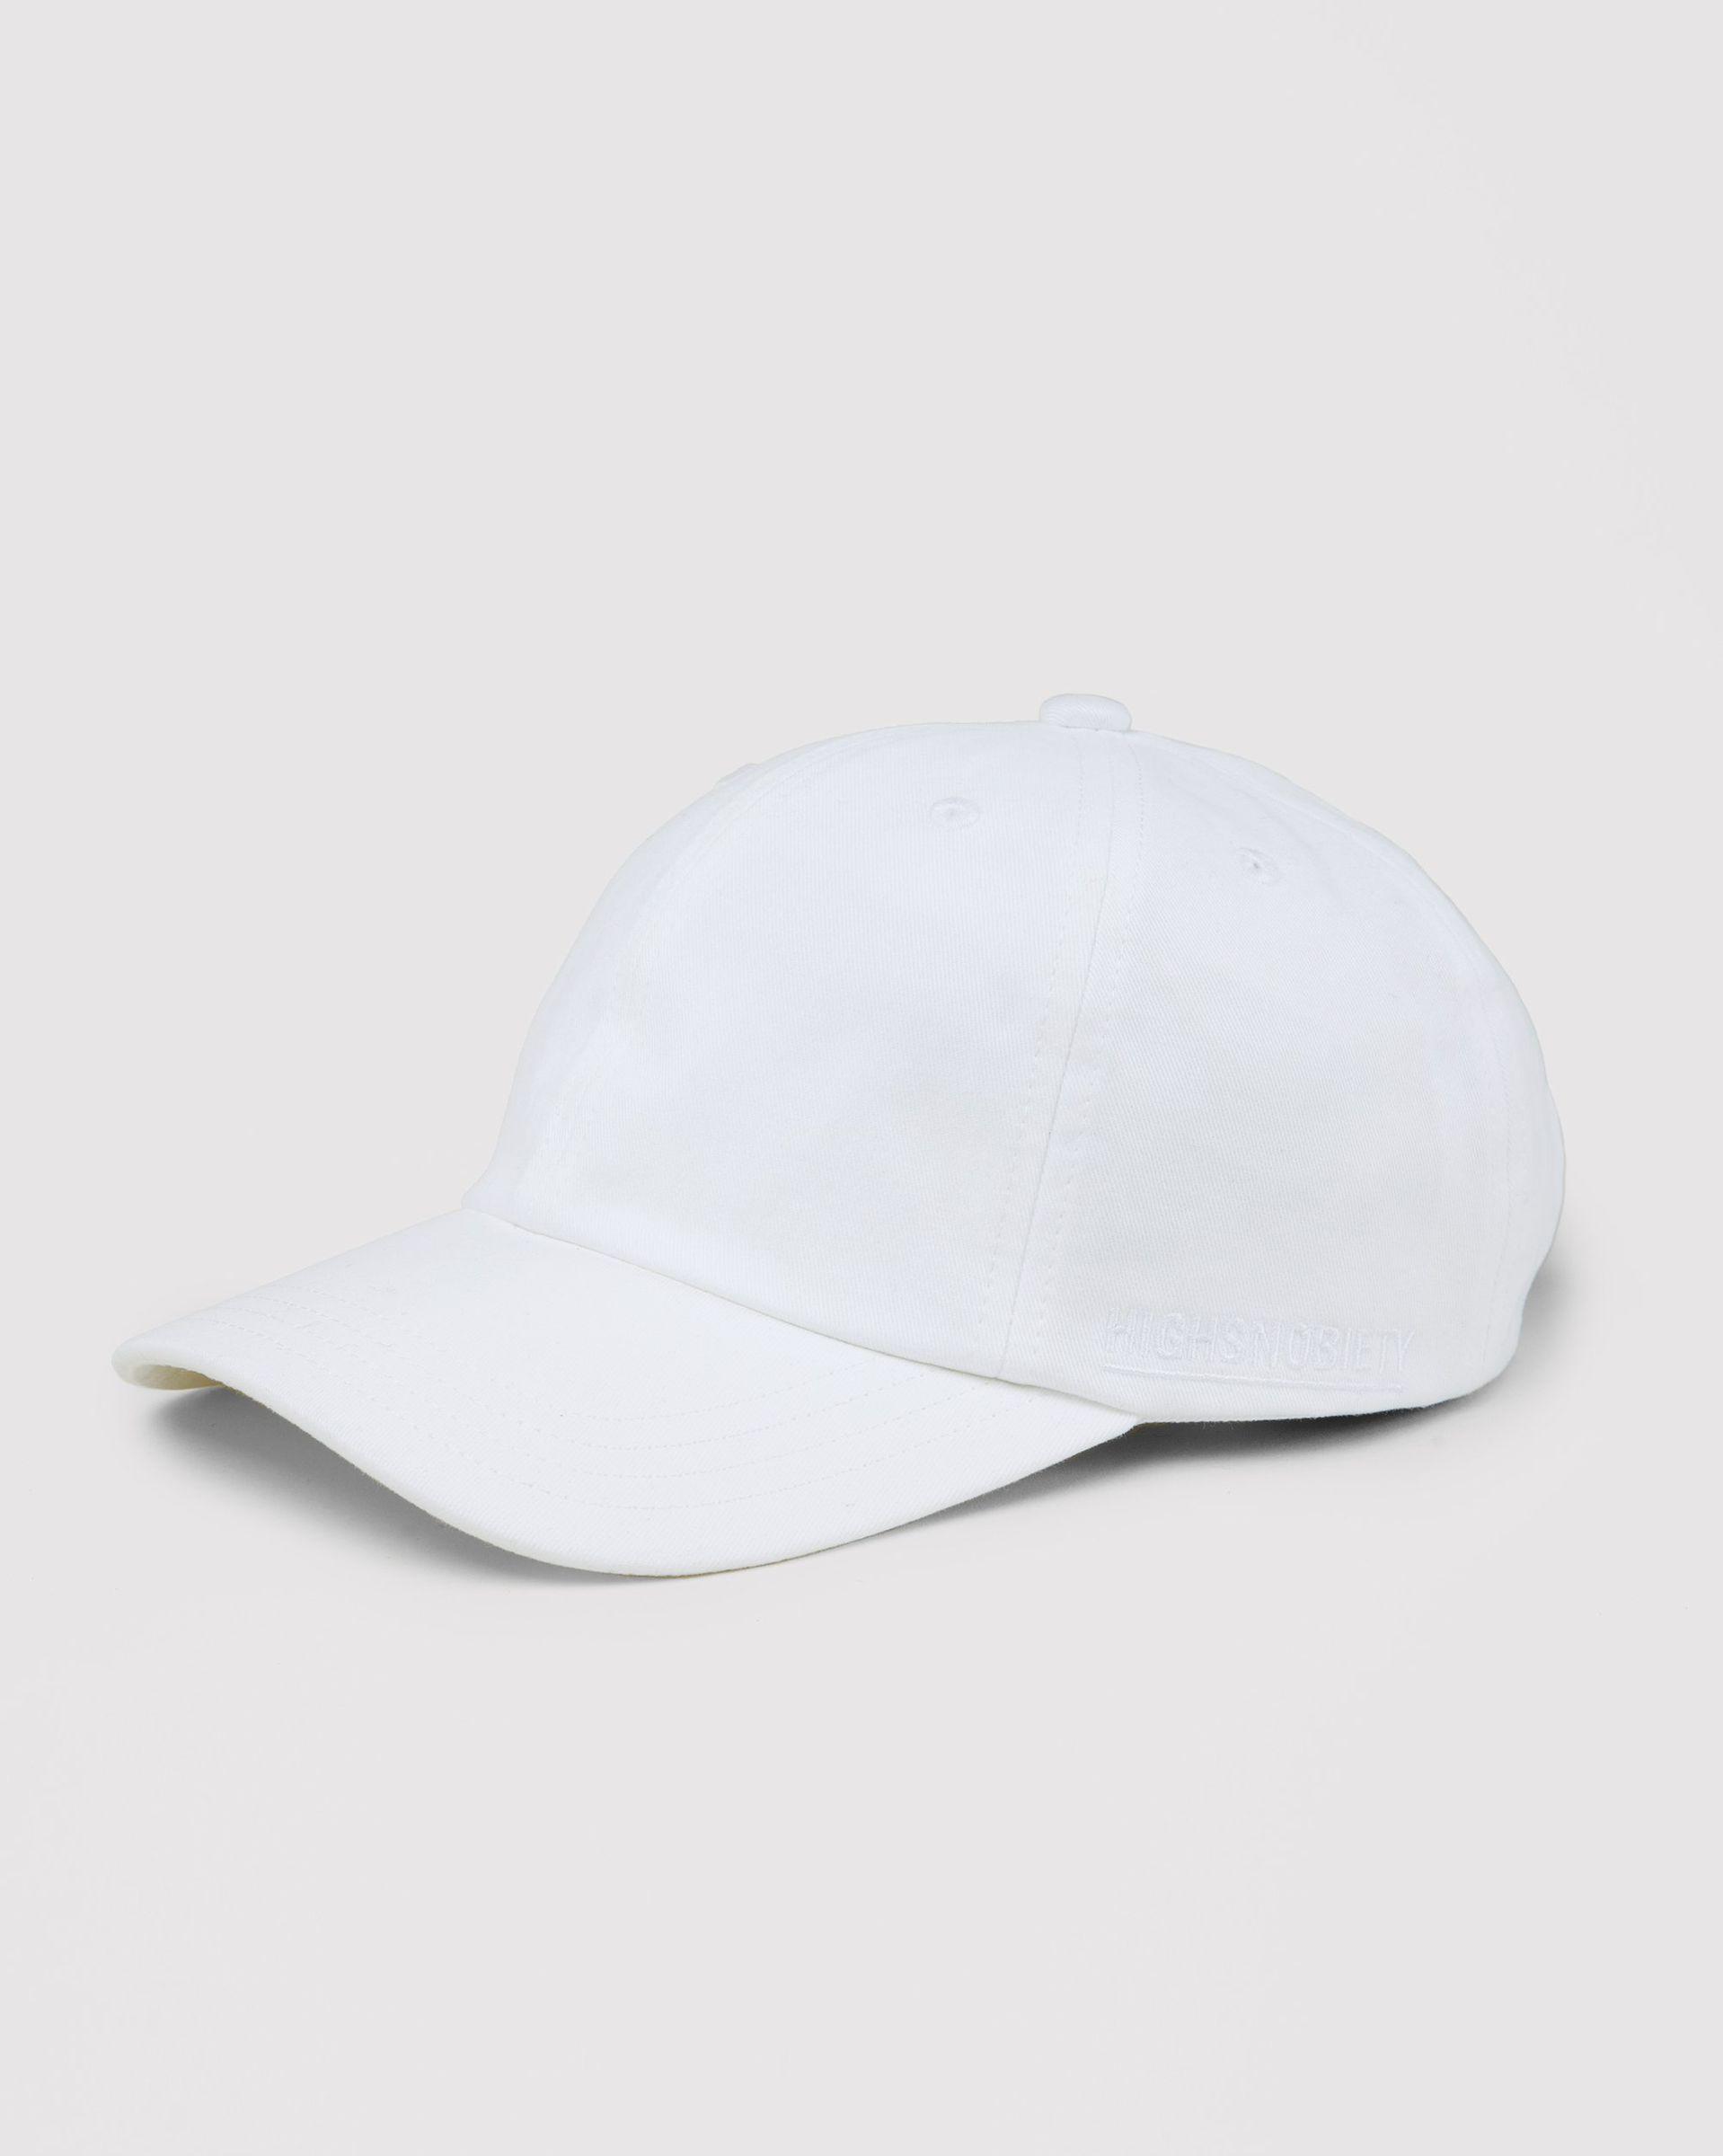 Highsnobiety Staples - Cap White - Image 1